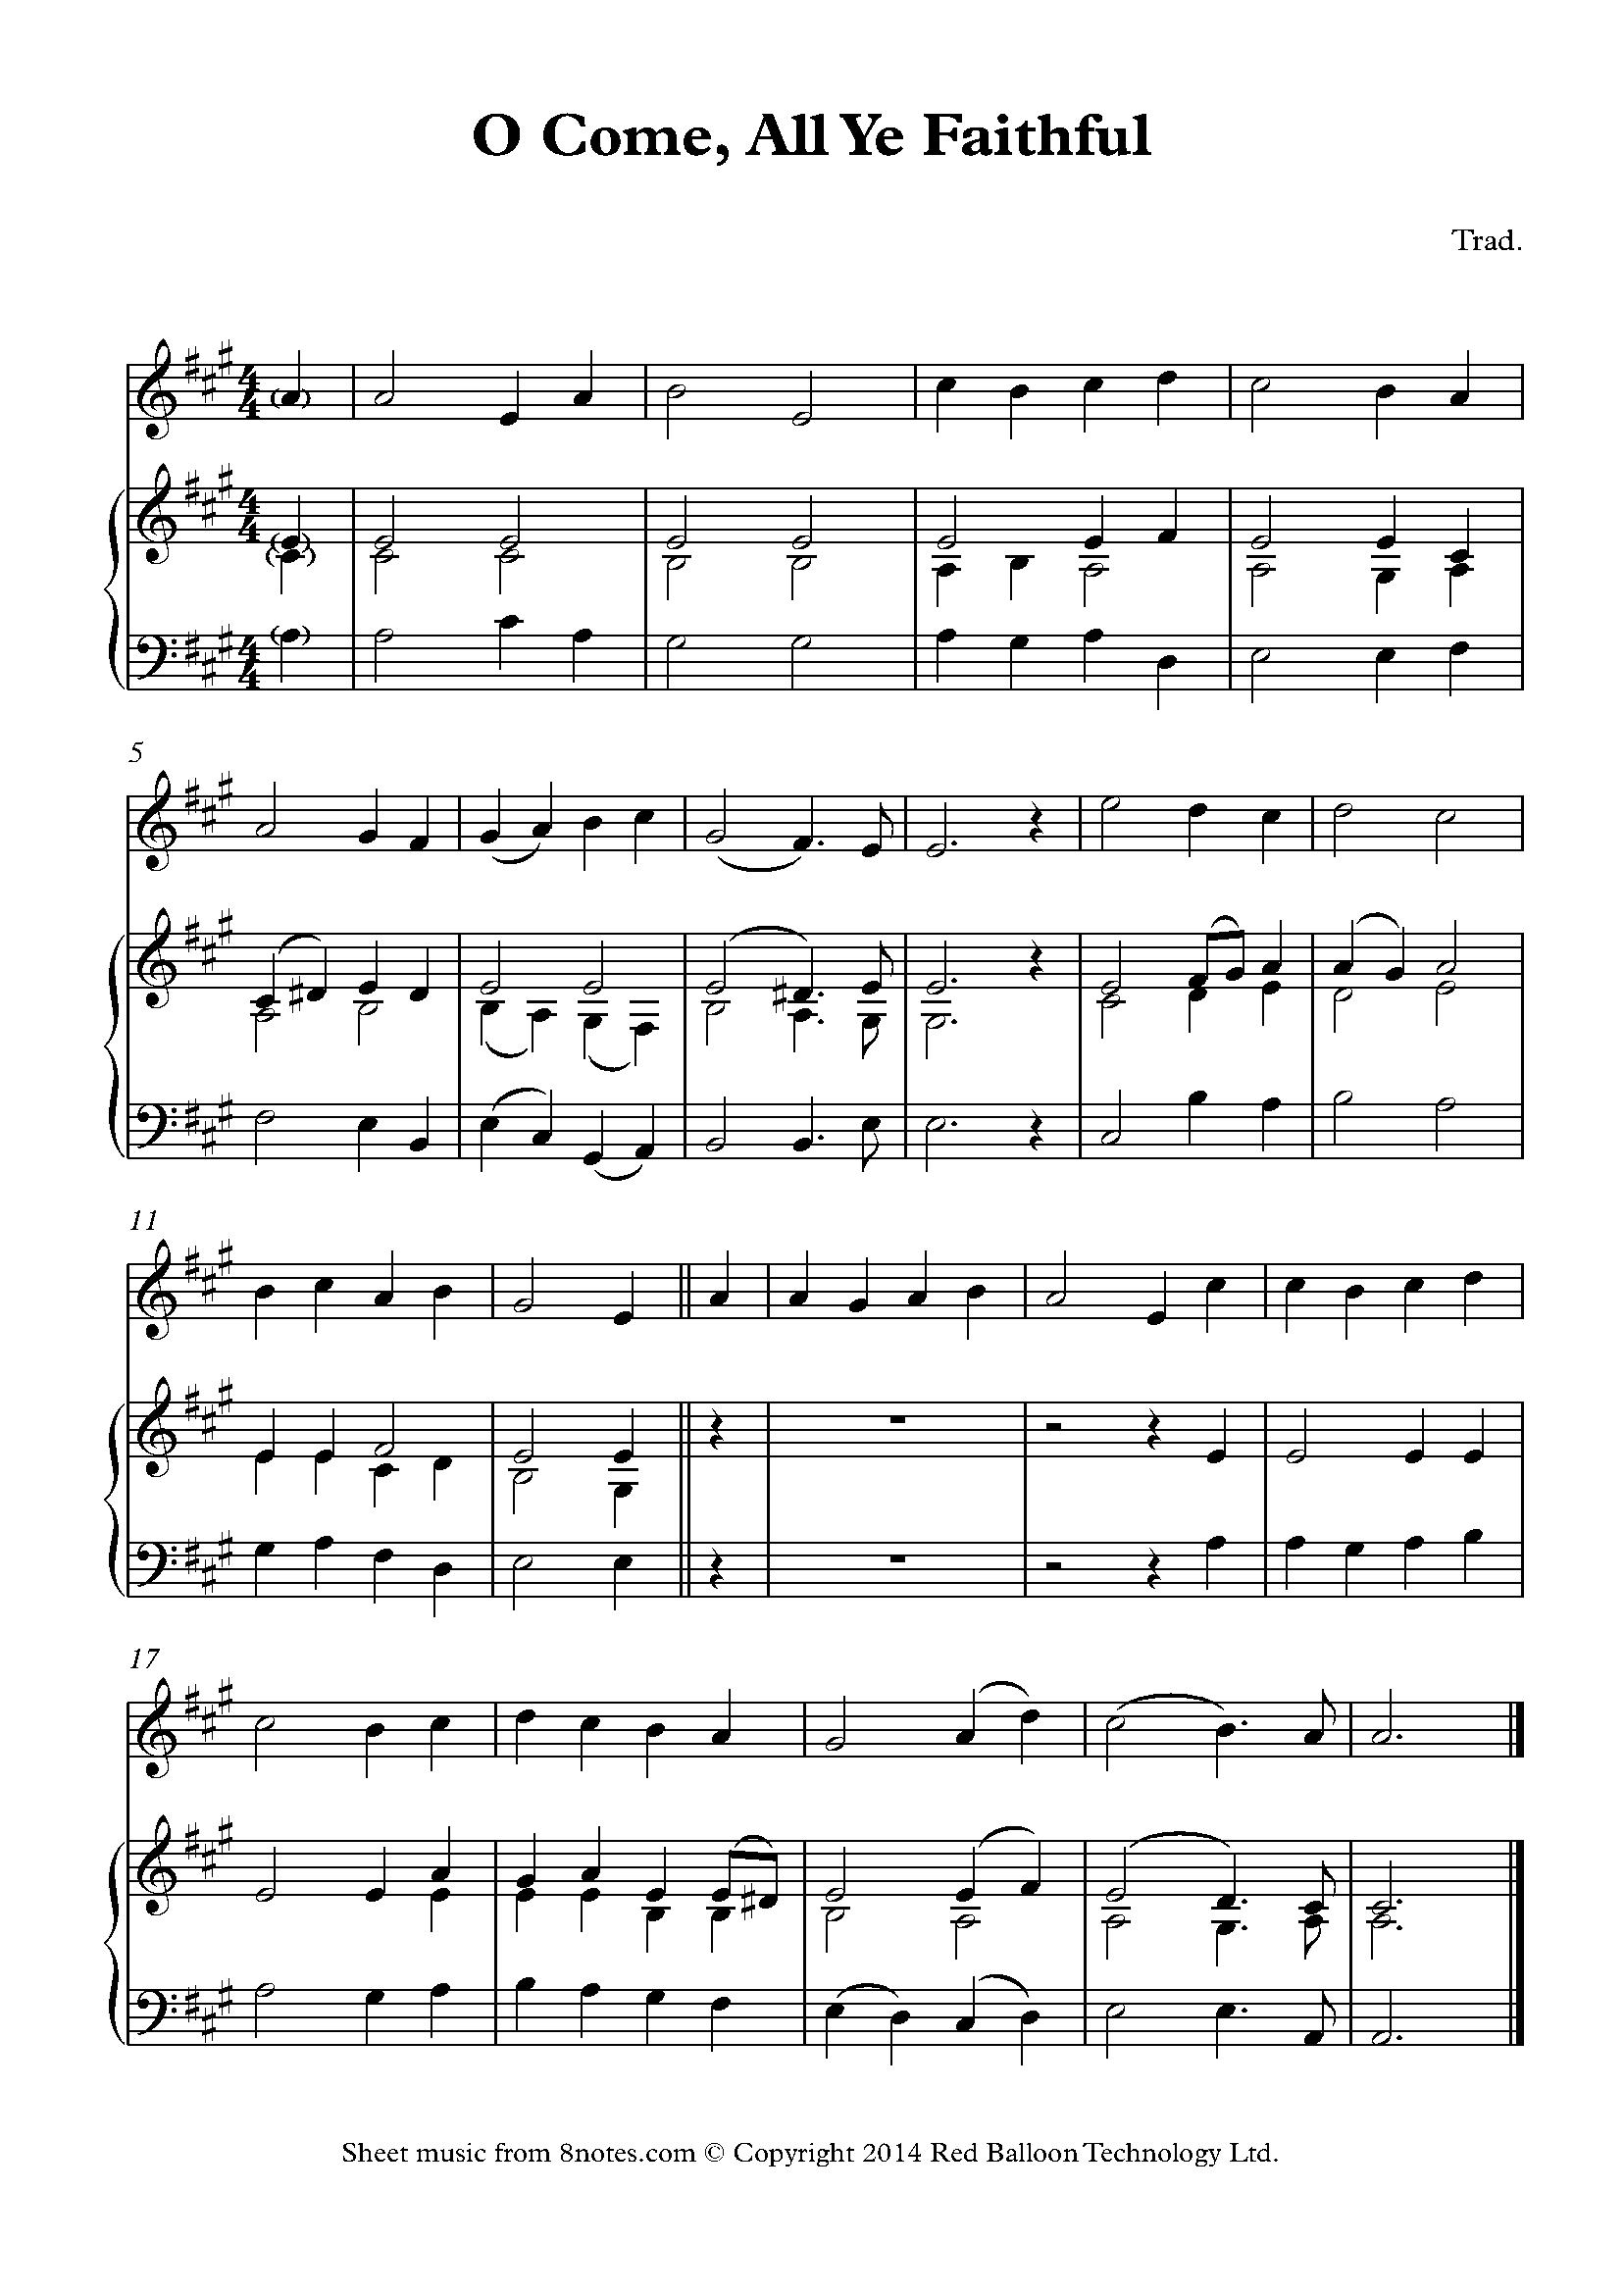 O Come All Ye Faithful Sheet Music For Violin